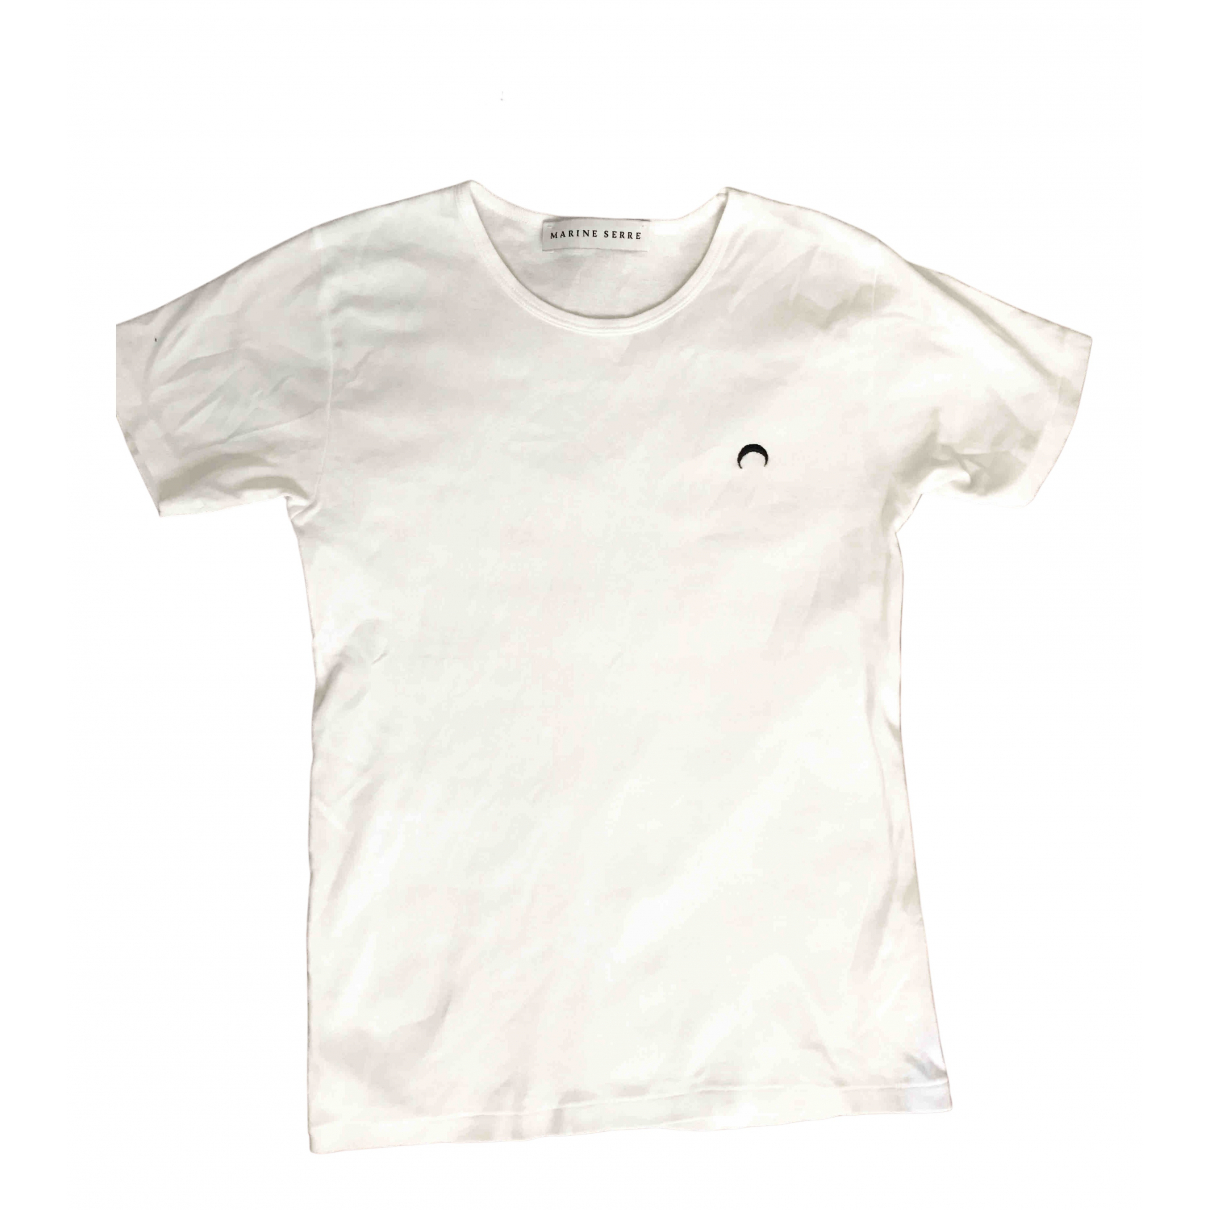 Camiseta Marine Serre